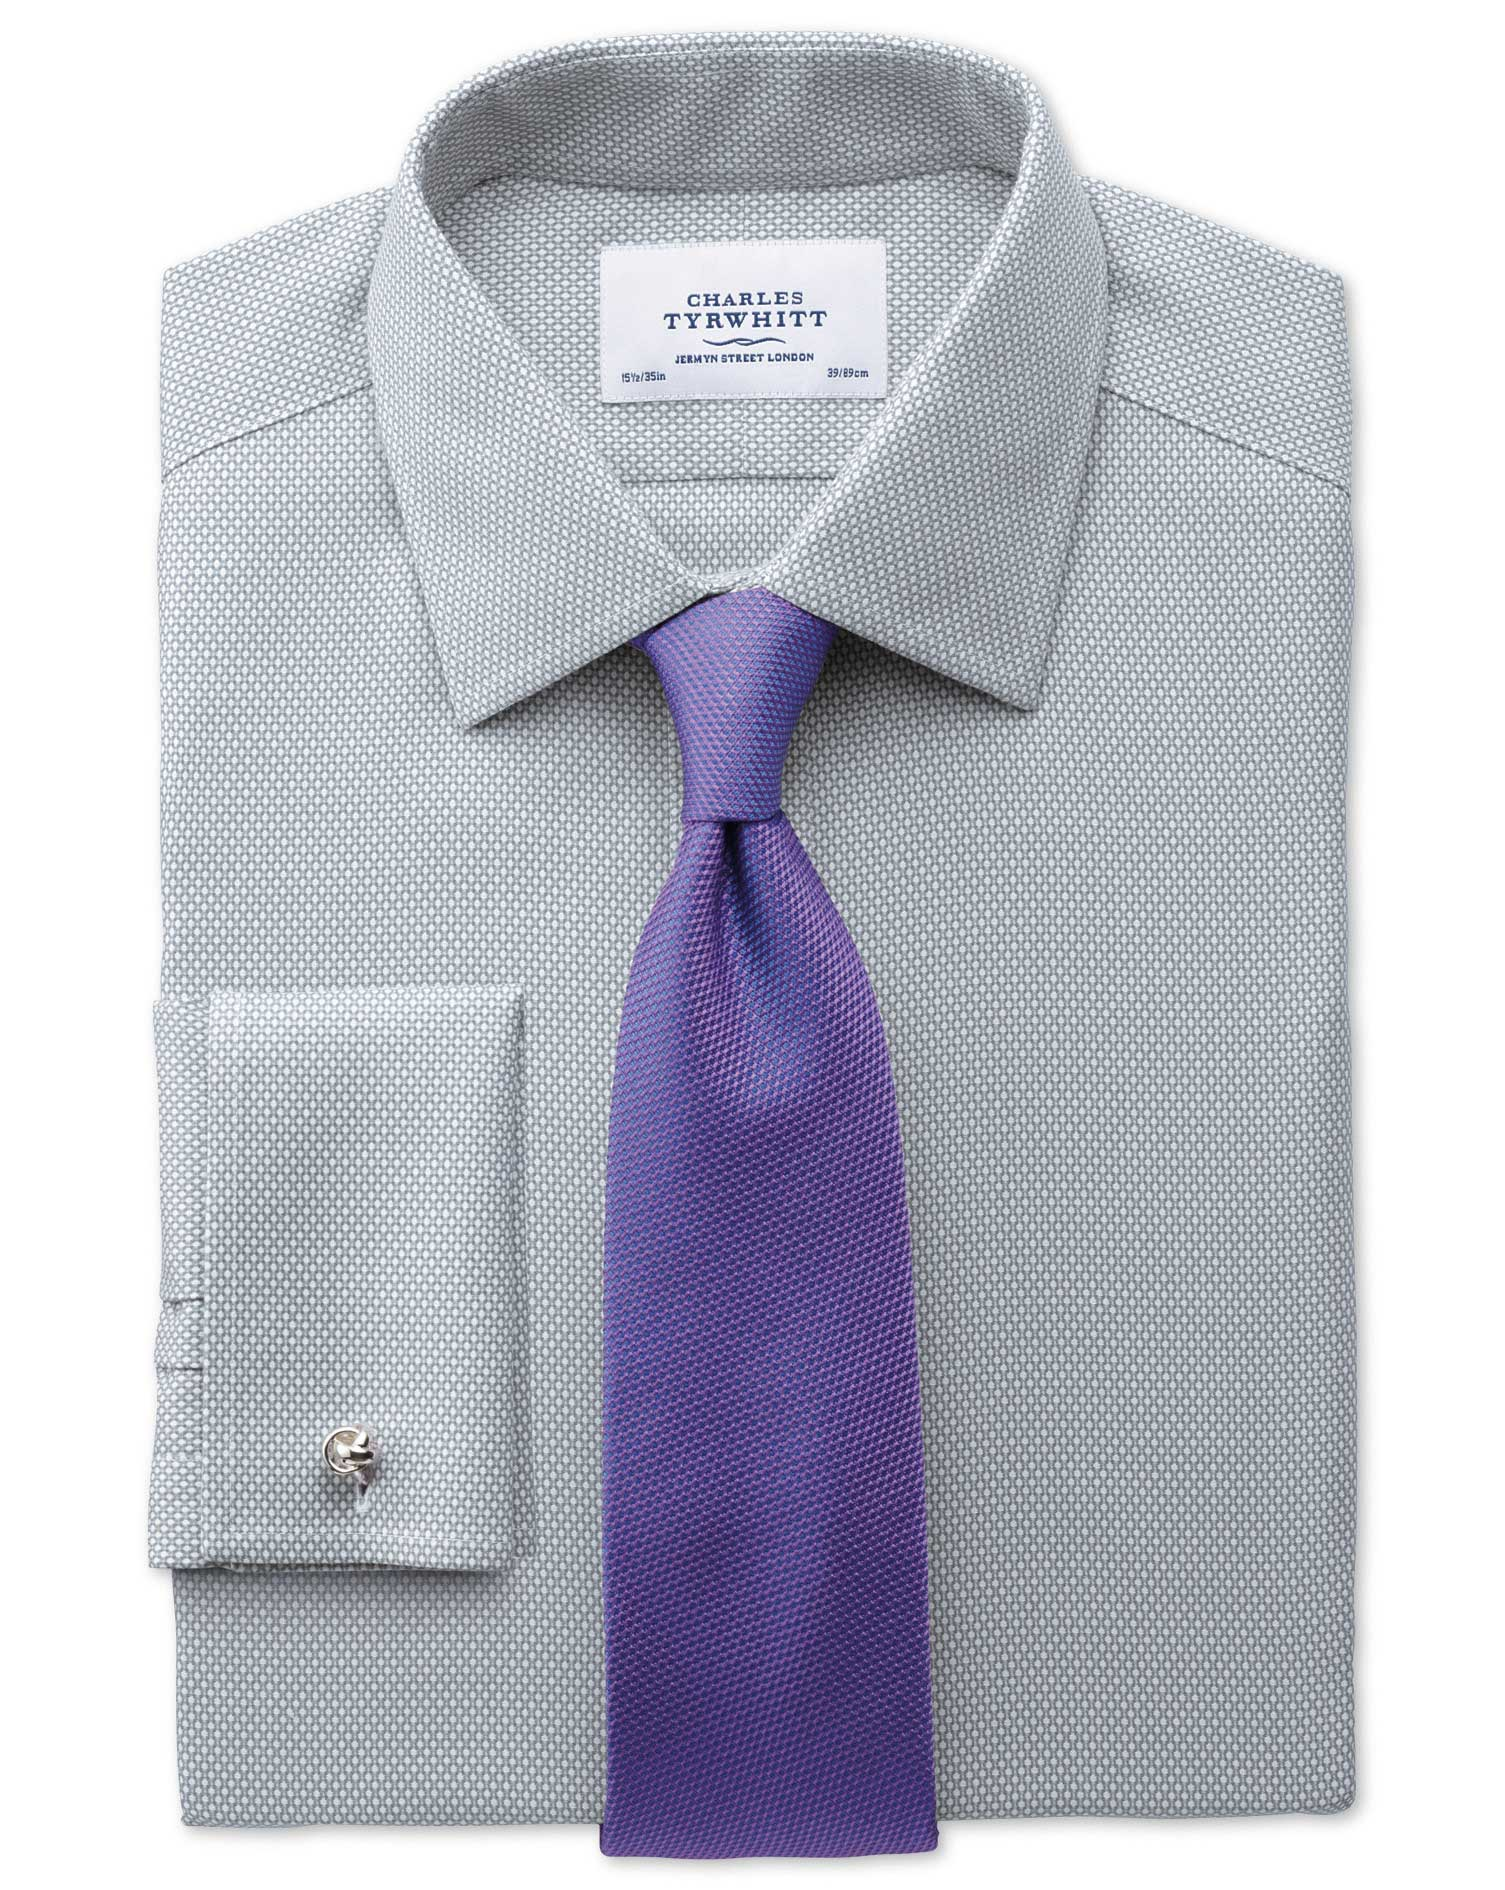 Extra Slim Fit Non Iron Honeycomb Grey Shirt Charles